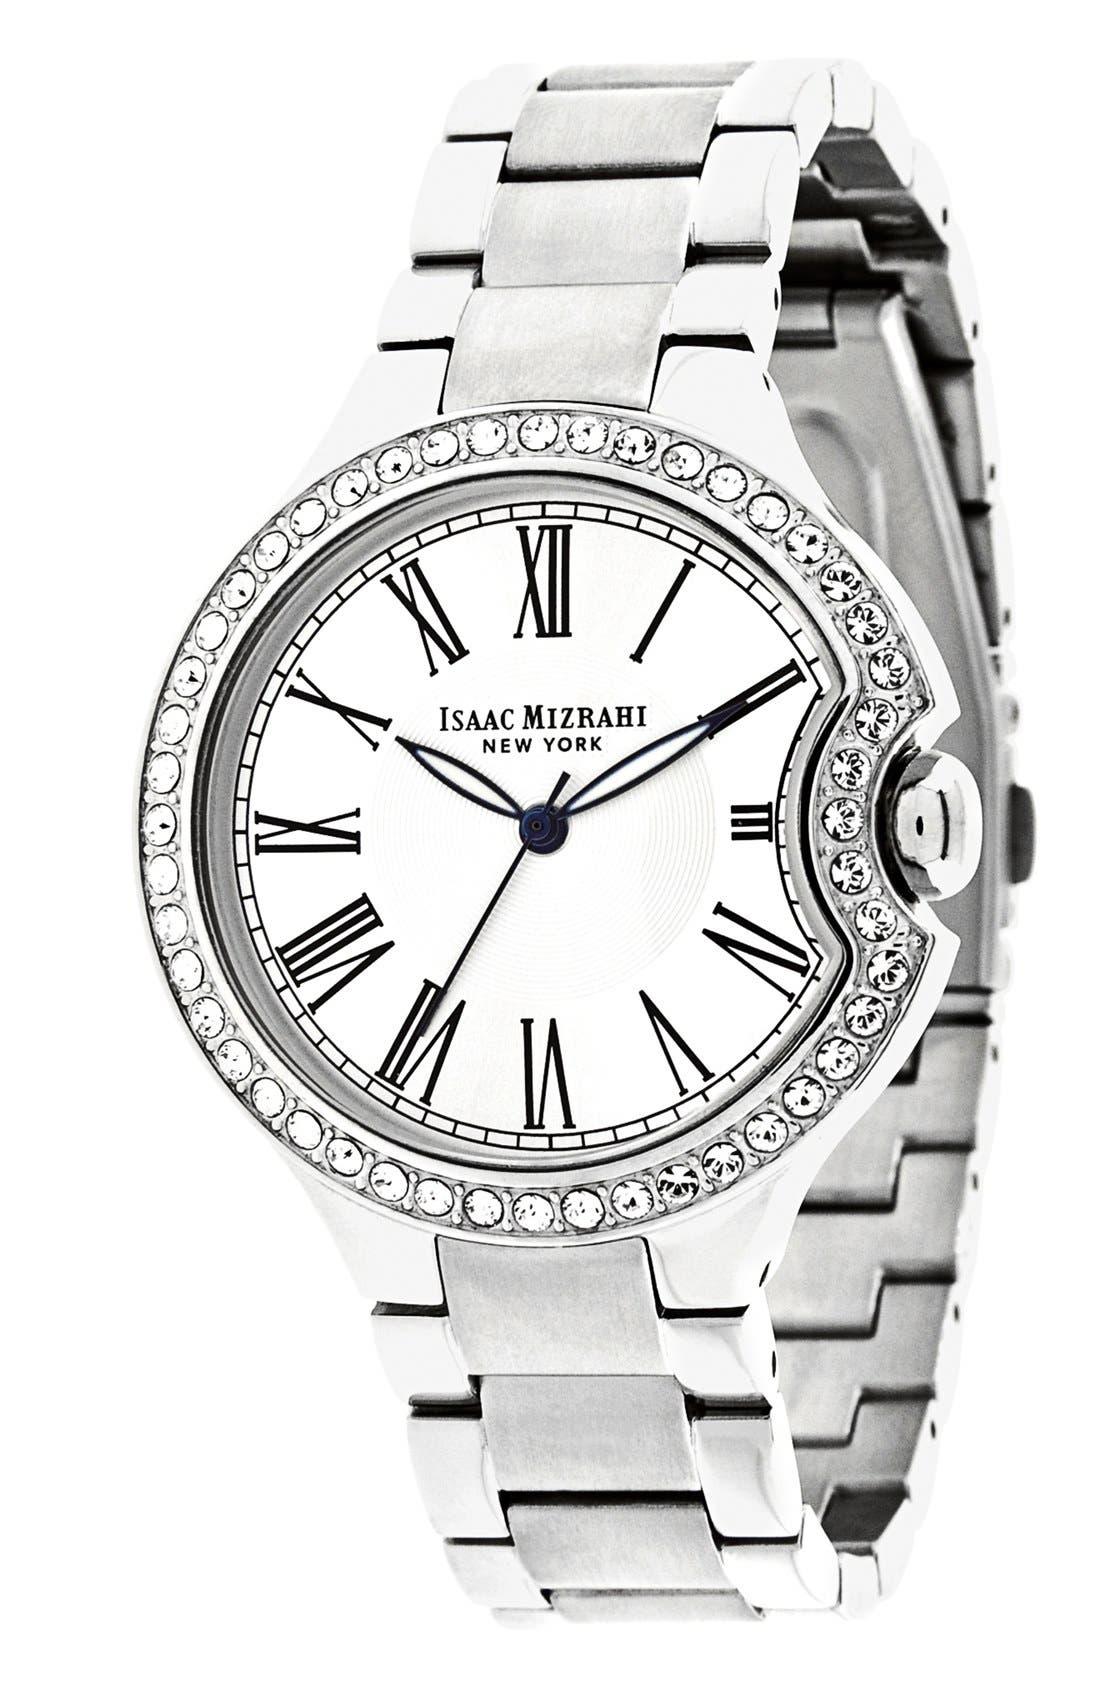 Main Image - Isaac Mizrahi New York Round Roman Numeral Bracelet Watch, 38mm